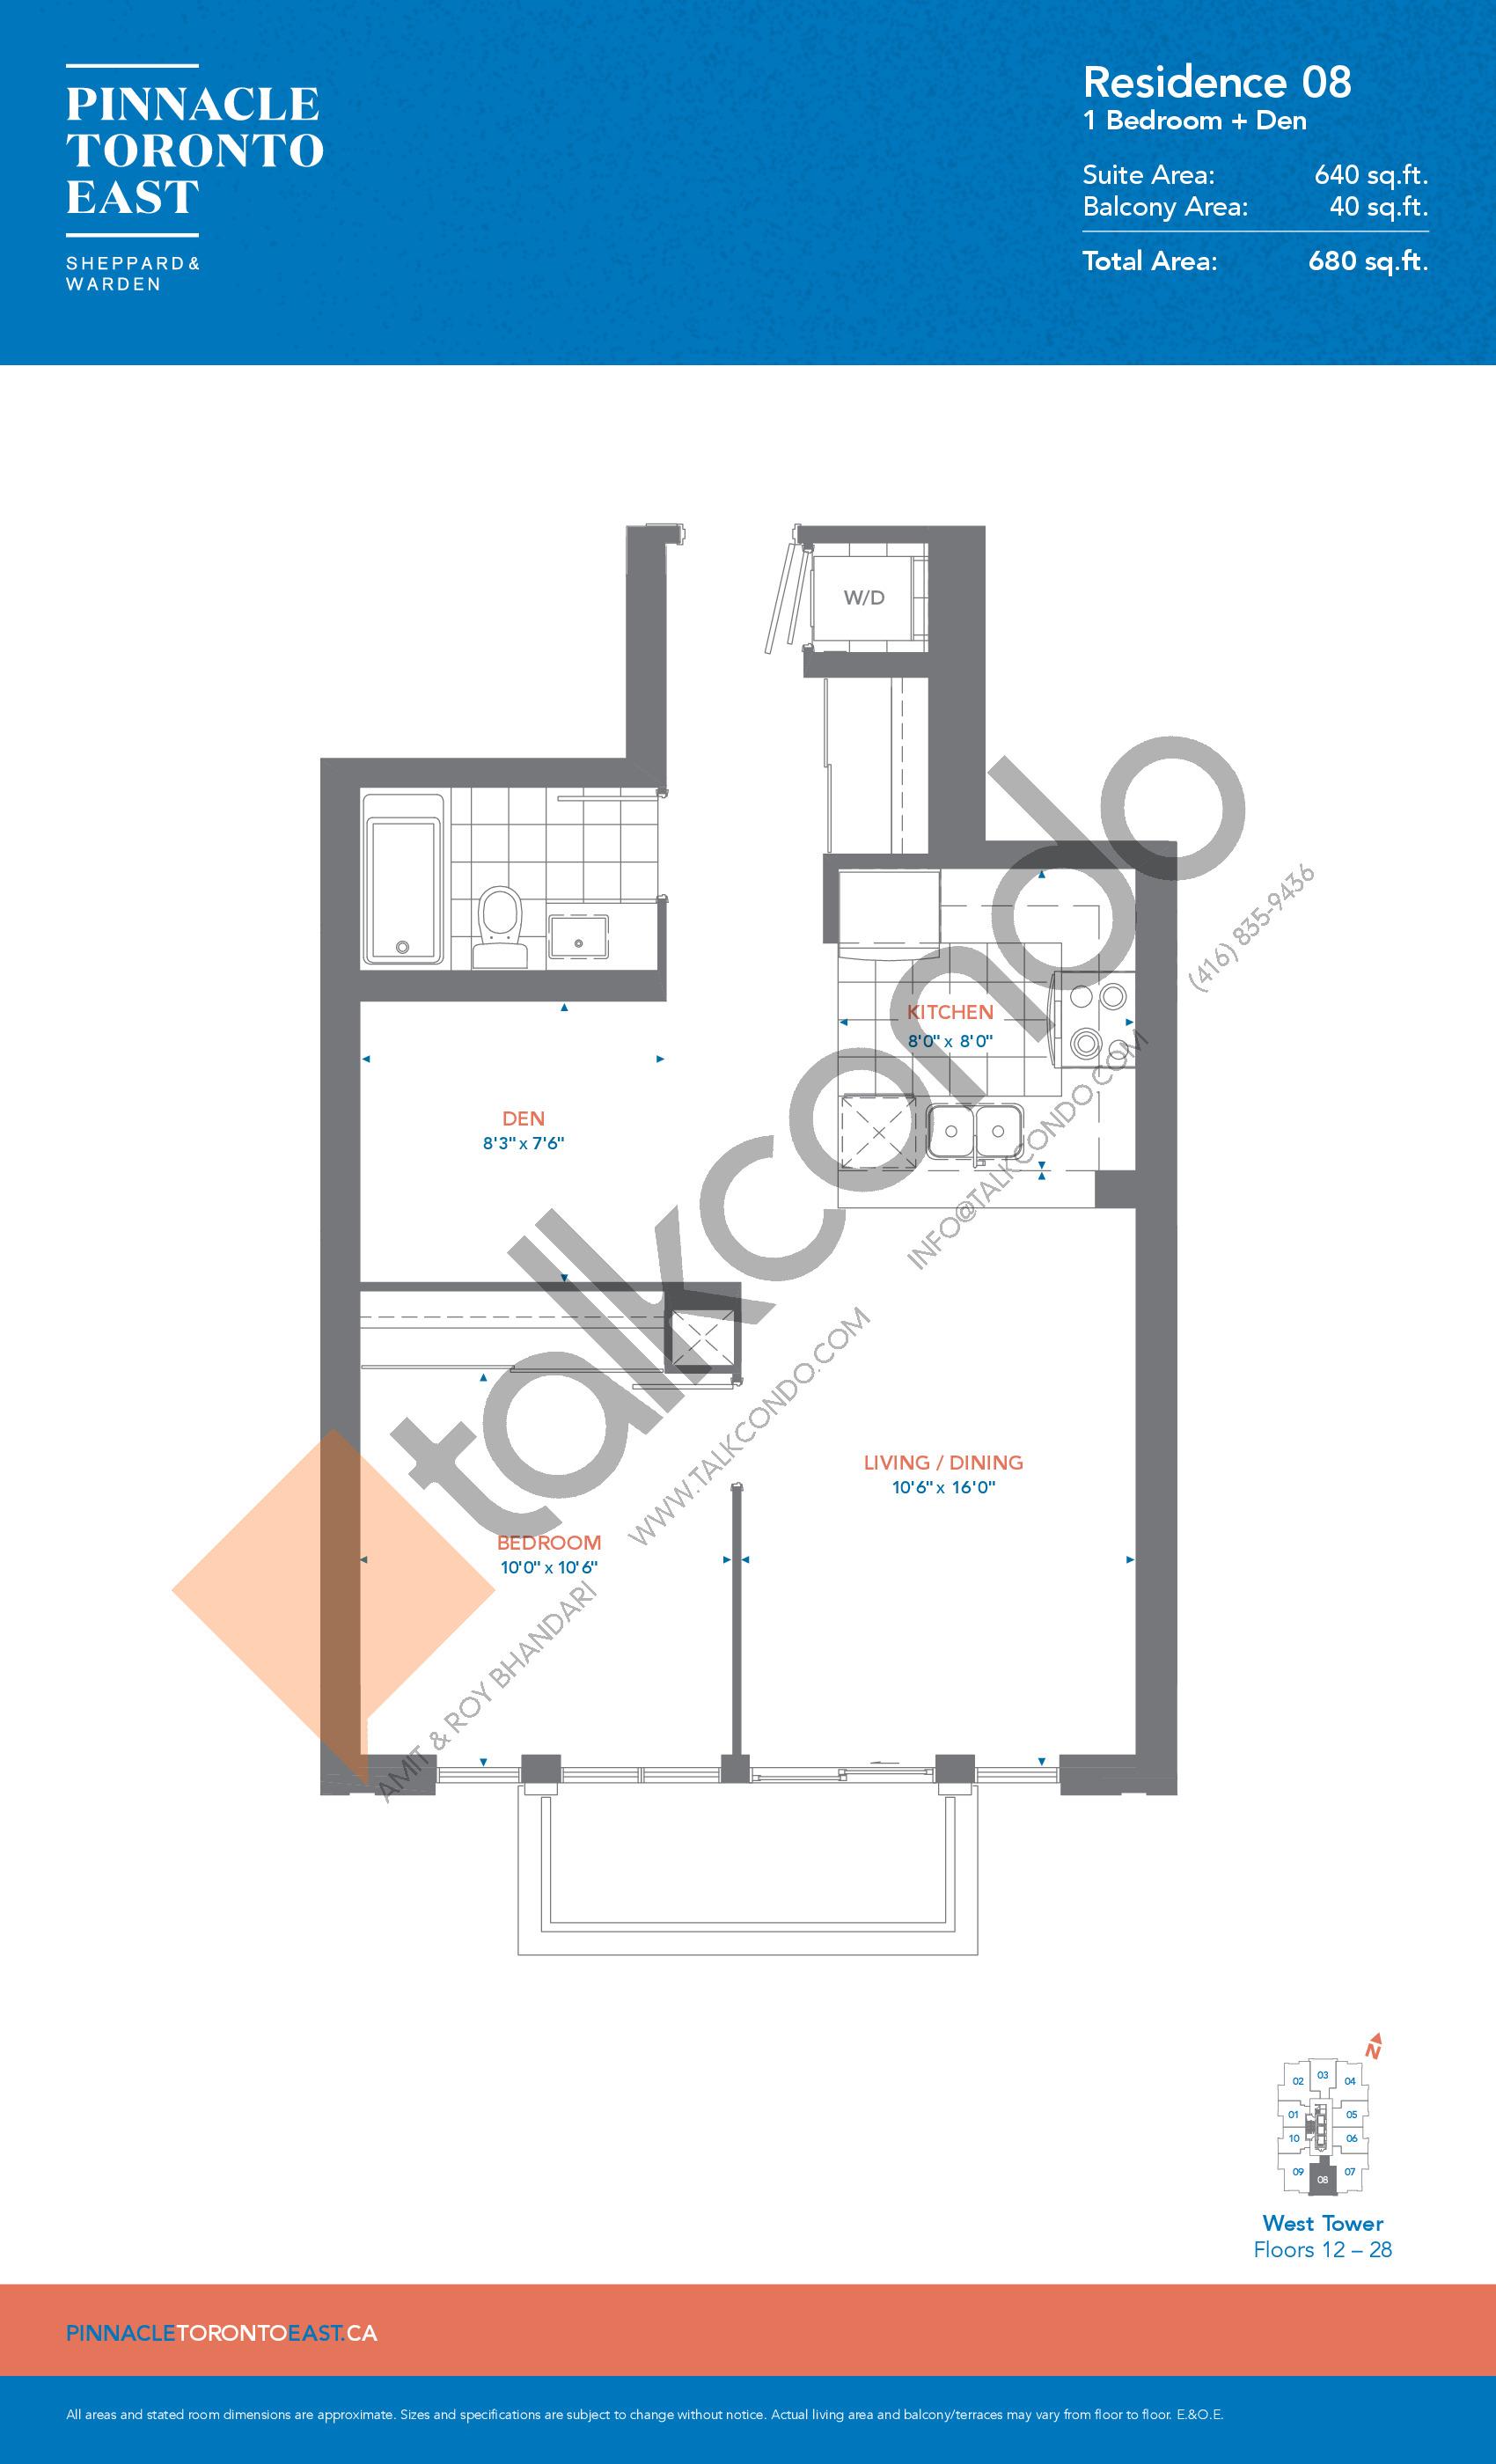 Residence 08 - West Tower Floor Plan at Pinnacle Toronto East Condos - 640 sq.ft